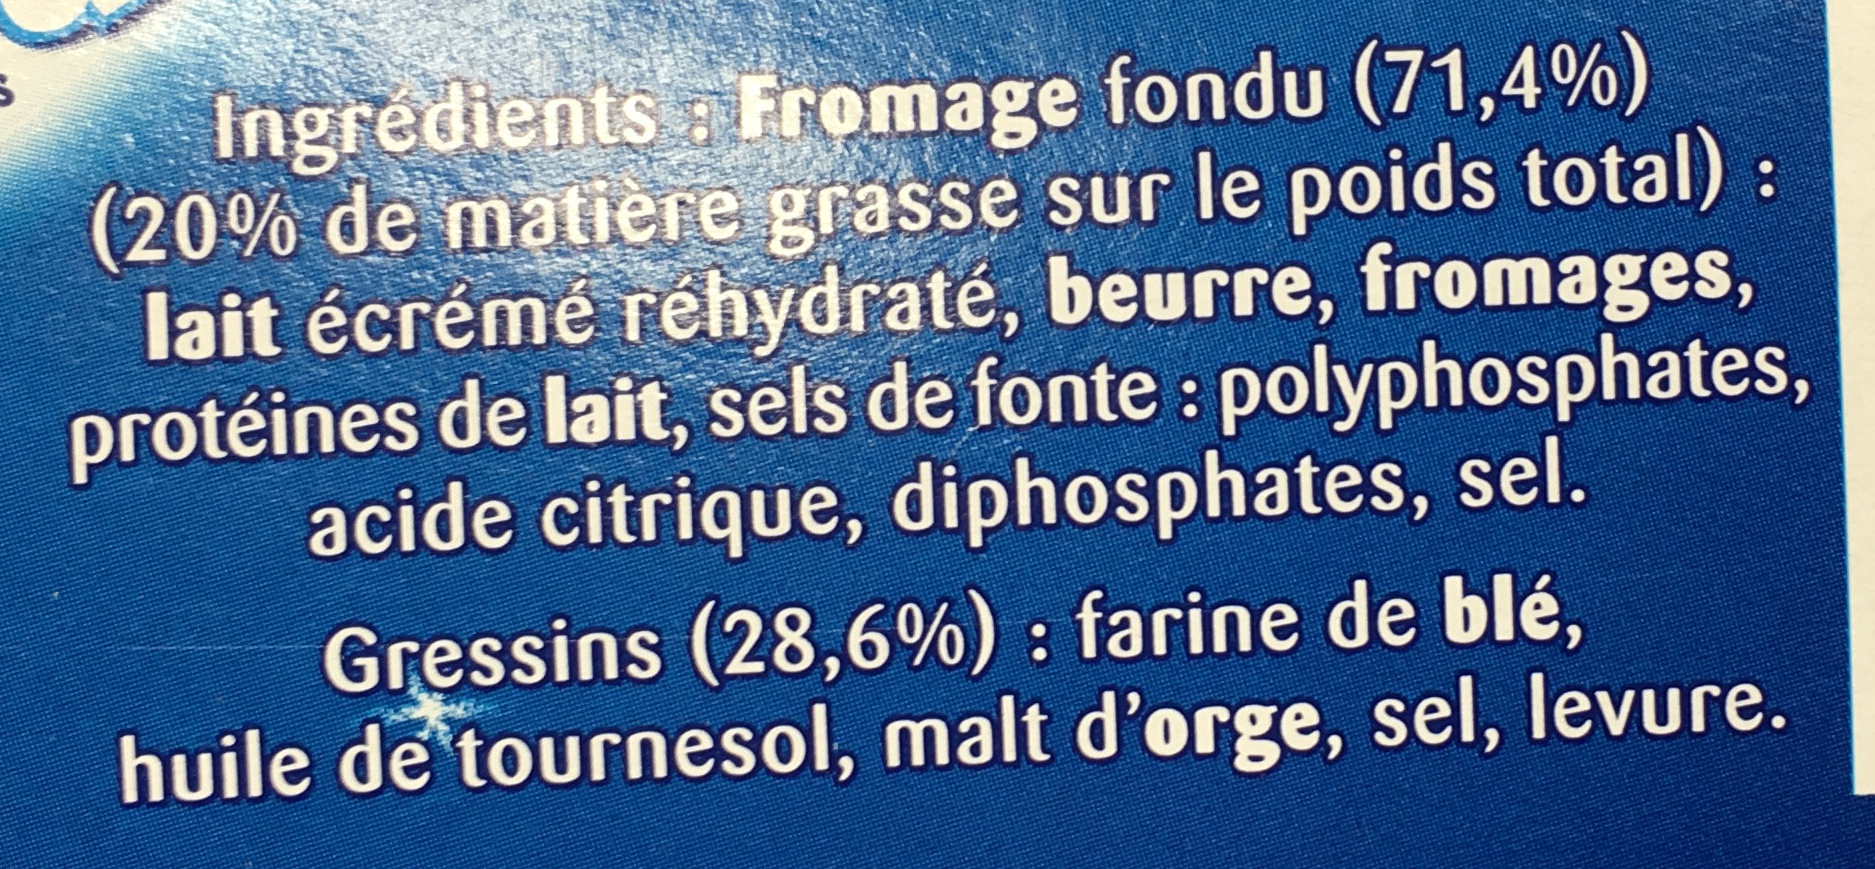 Fromage fondu et gressins - Ingrediënten - fr